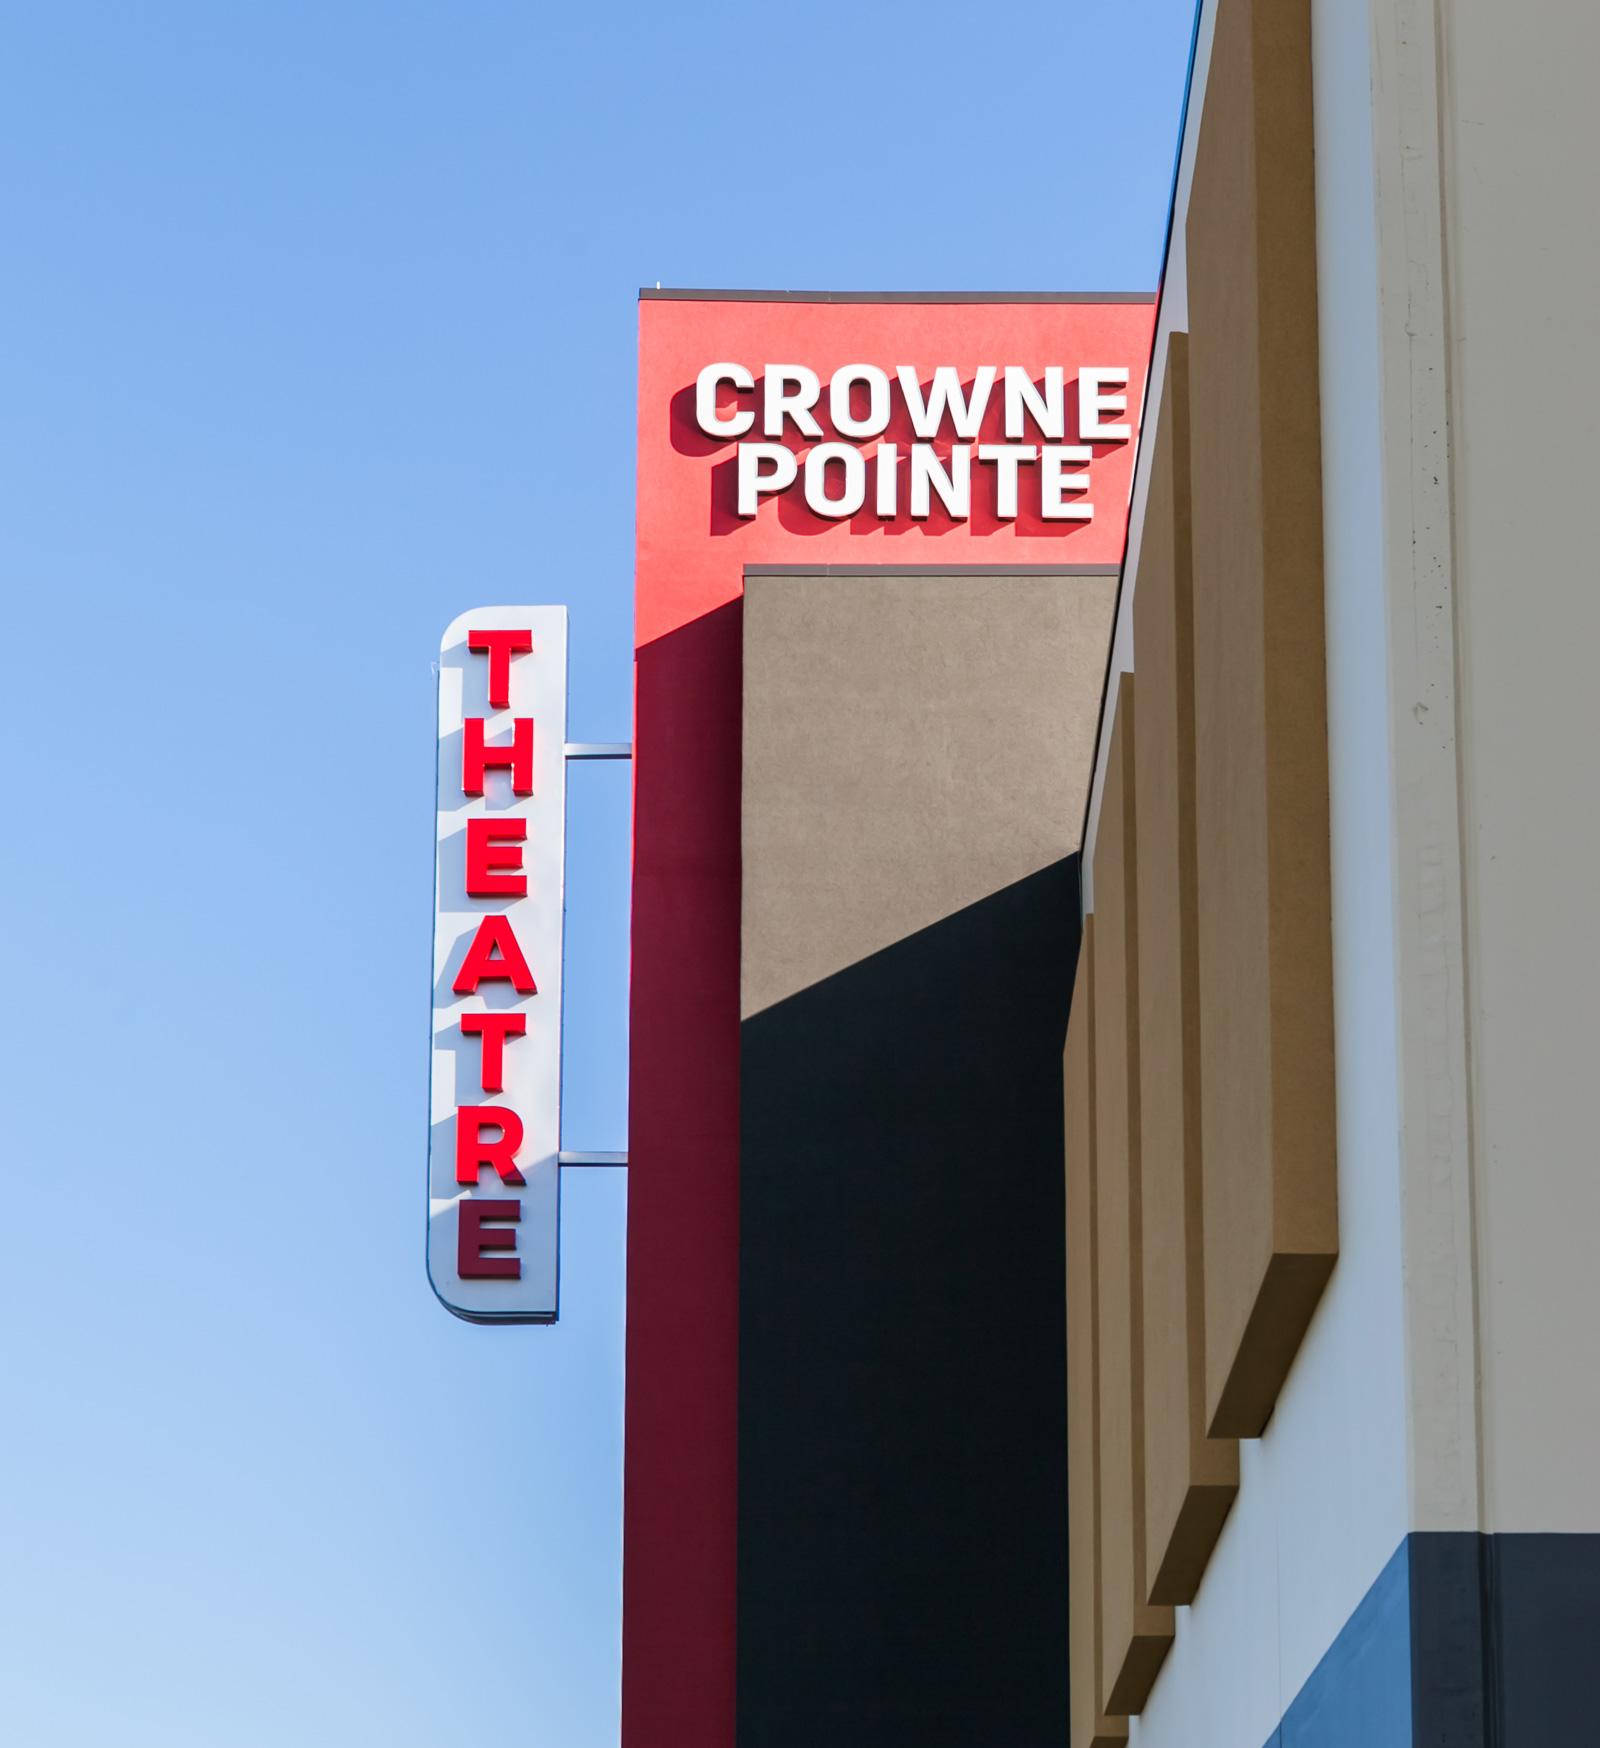 Crowne Pointe Theatre#Elizabethtown, KY